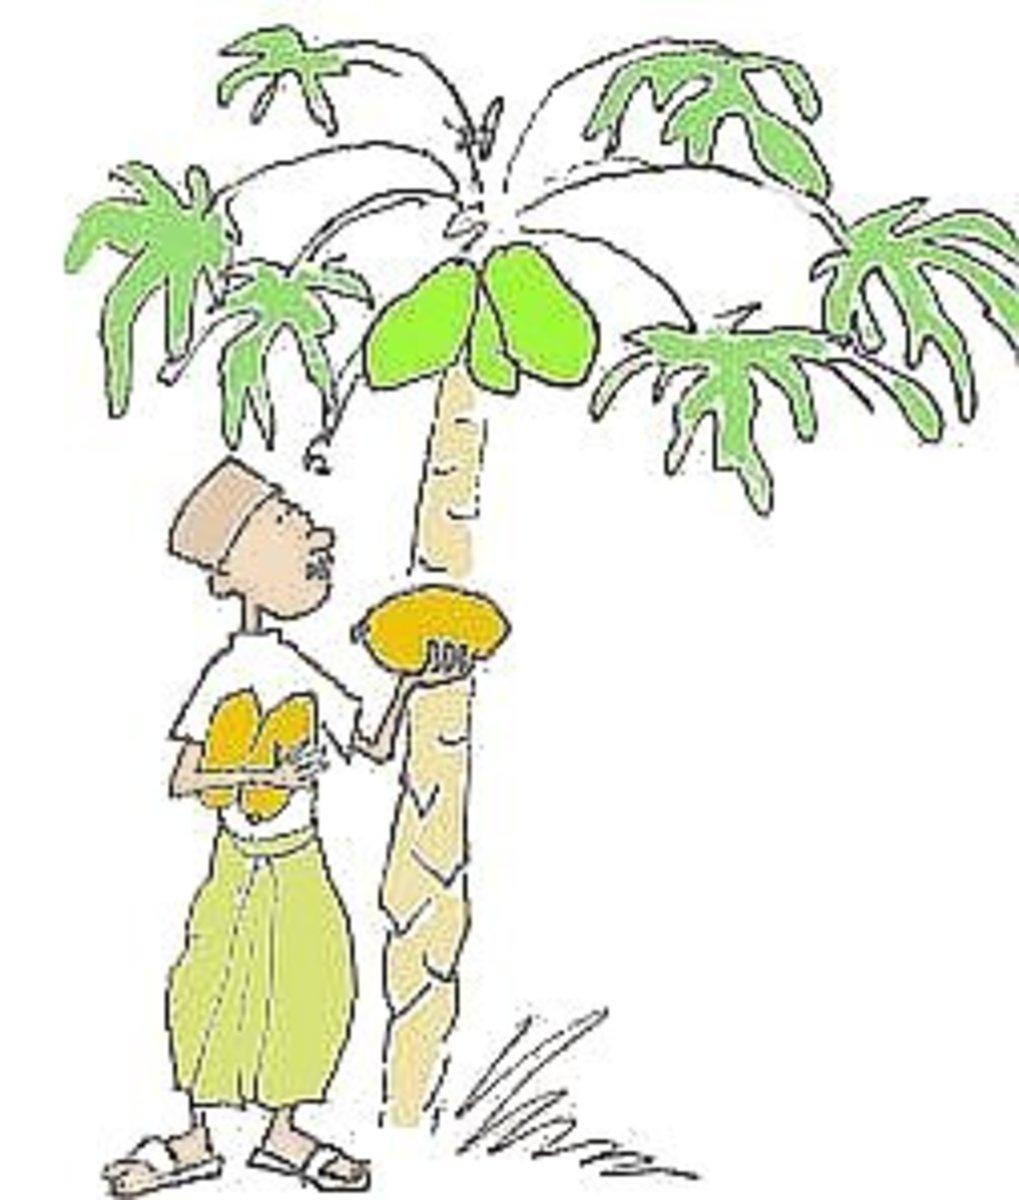 (carica papaya)